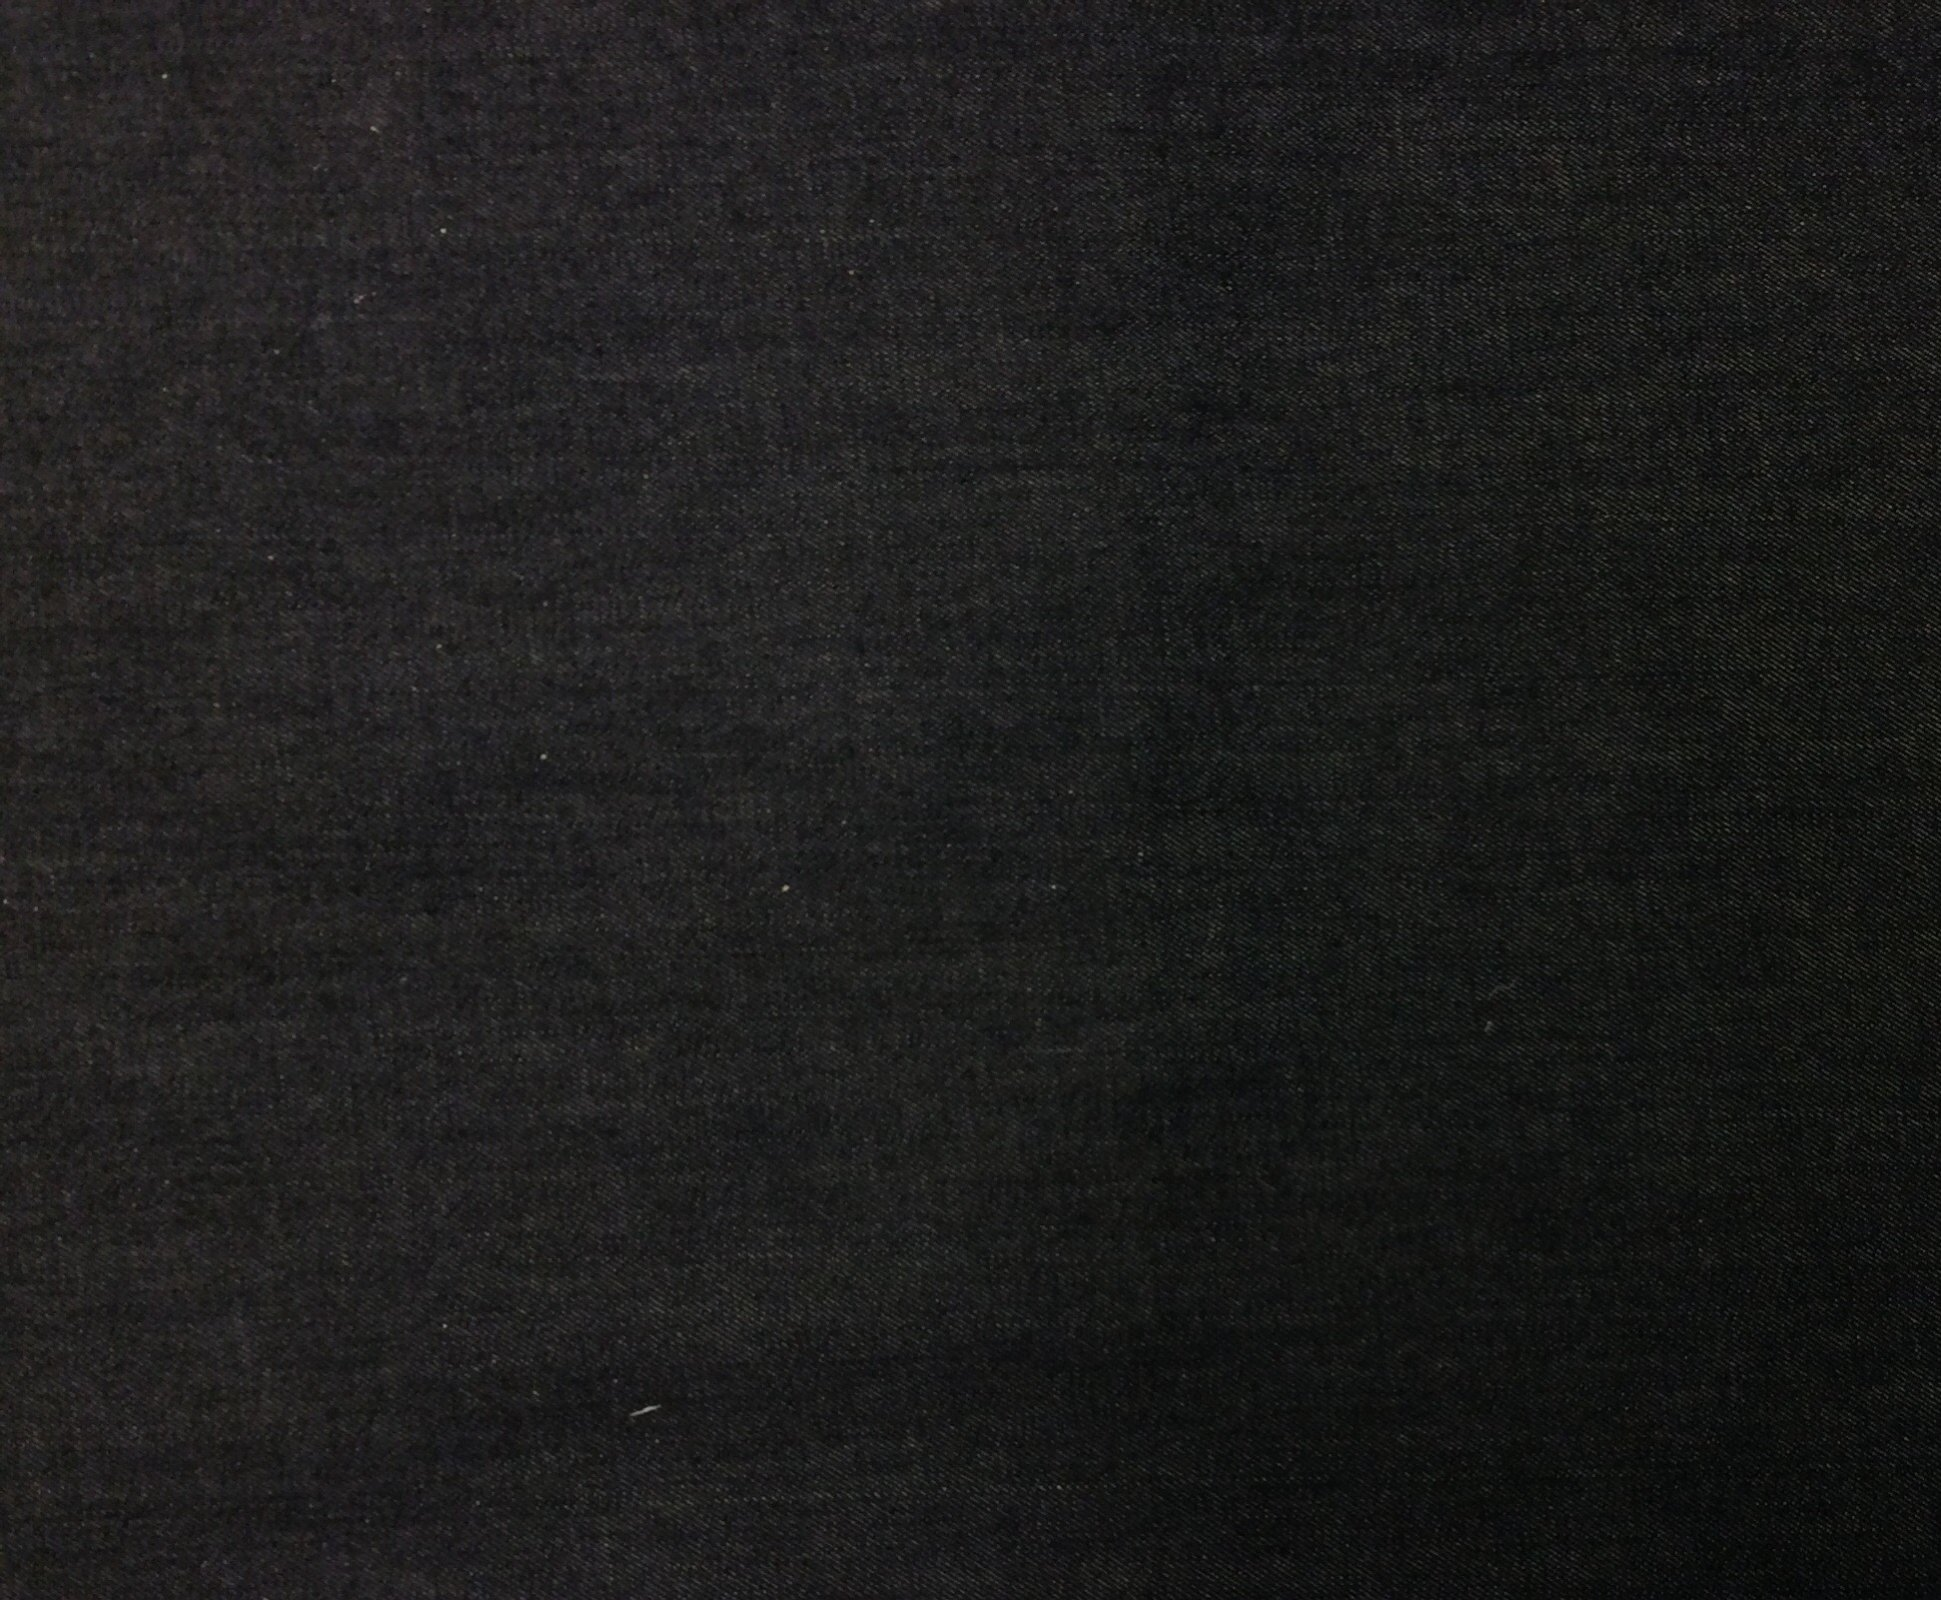 Denim ITALY Selvedge Denim Cotton Apparel Fabric RMDR3148A